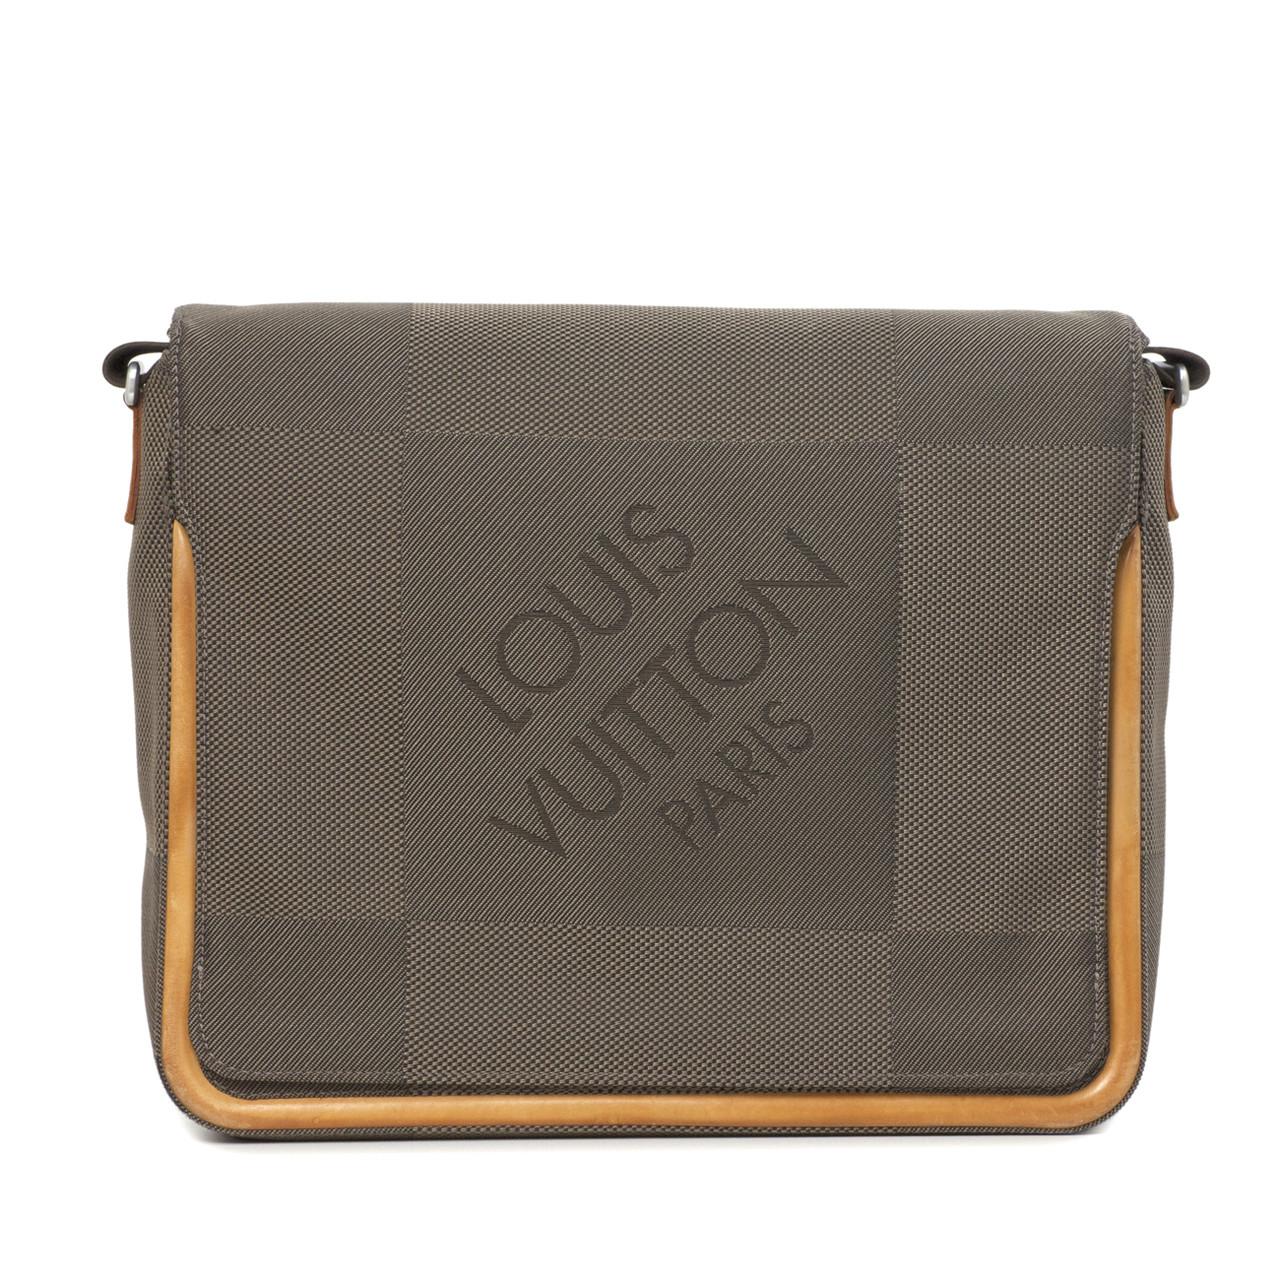 louis vuitton messenger bag. image 1; 2 louis vuitton messenger bag 7